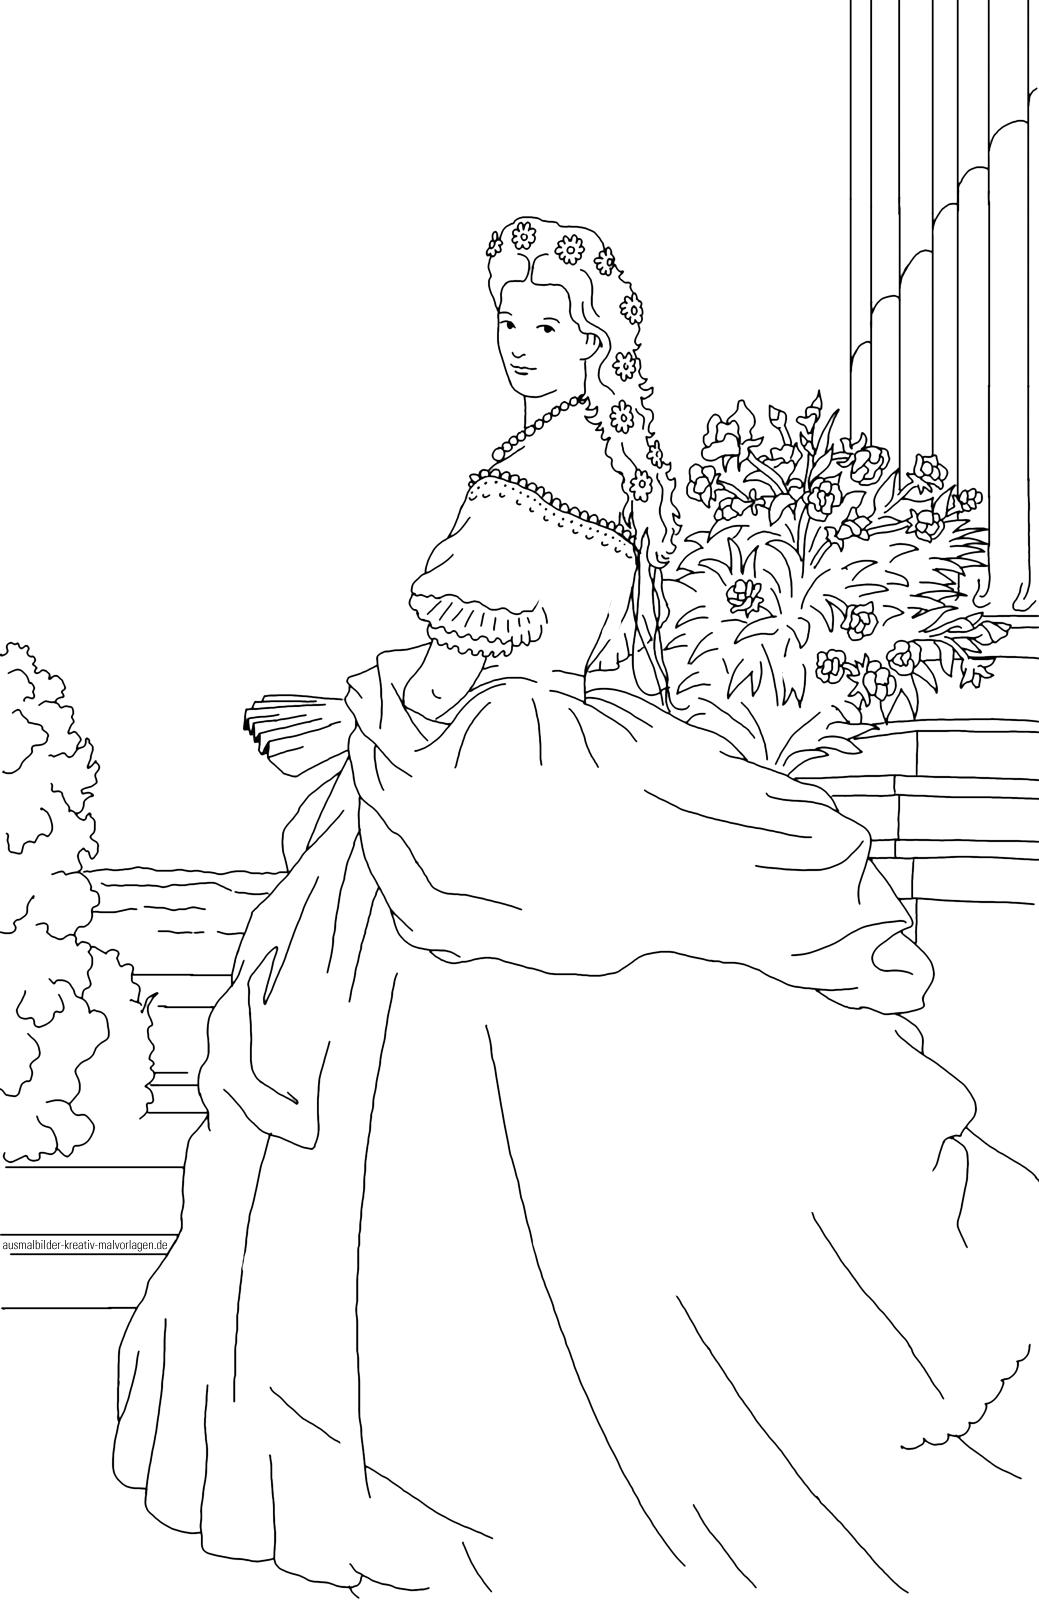 Eiskönigin Elsa Ausmalbilder : Ausmalbilder Topmodel Kostenlos 178 Jpg 1039 1600 Aty